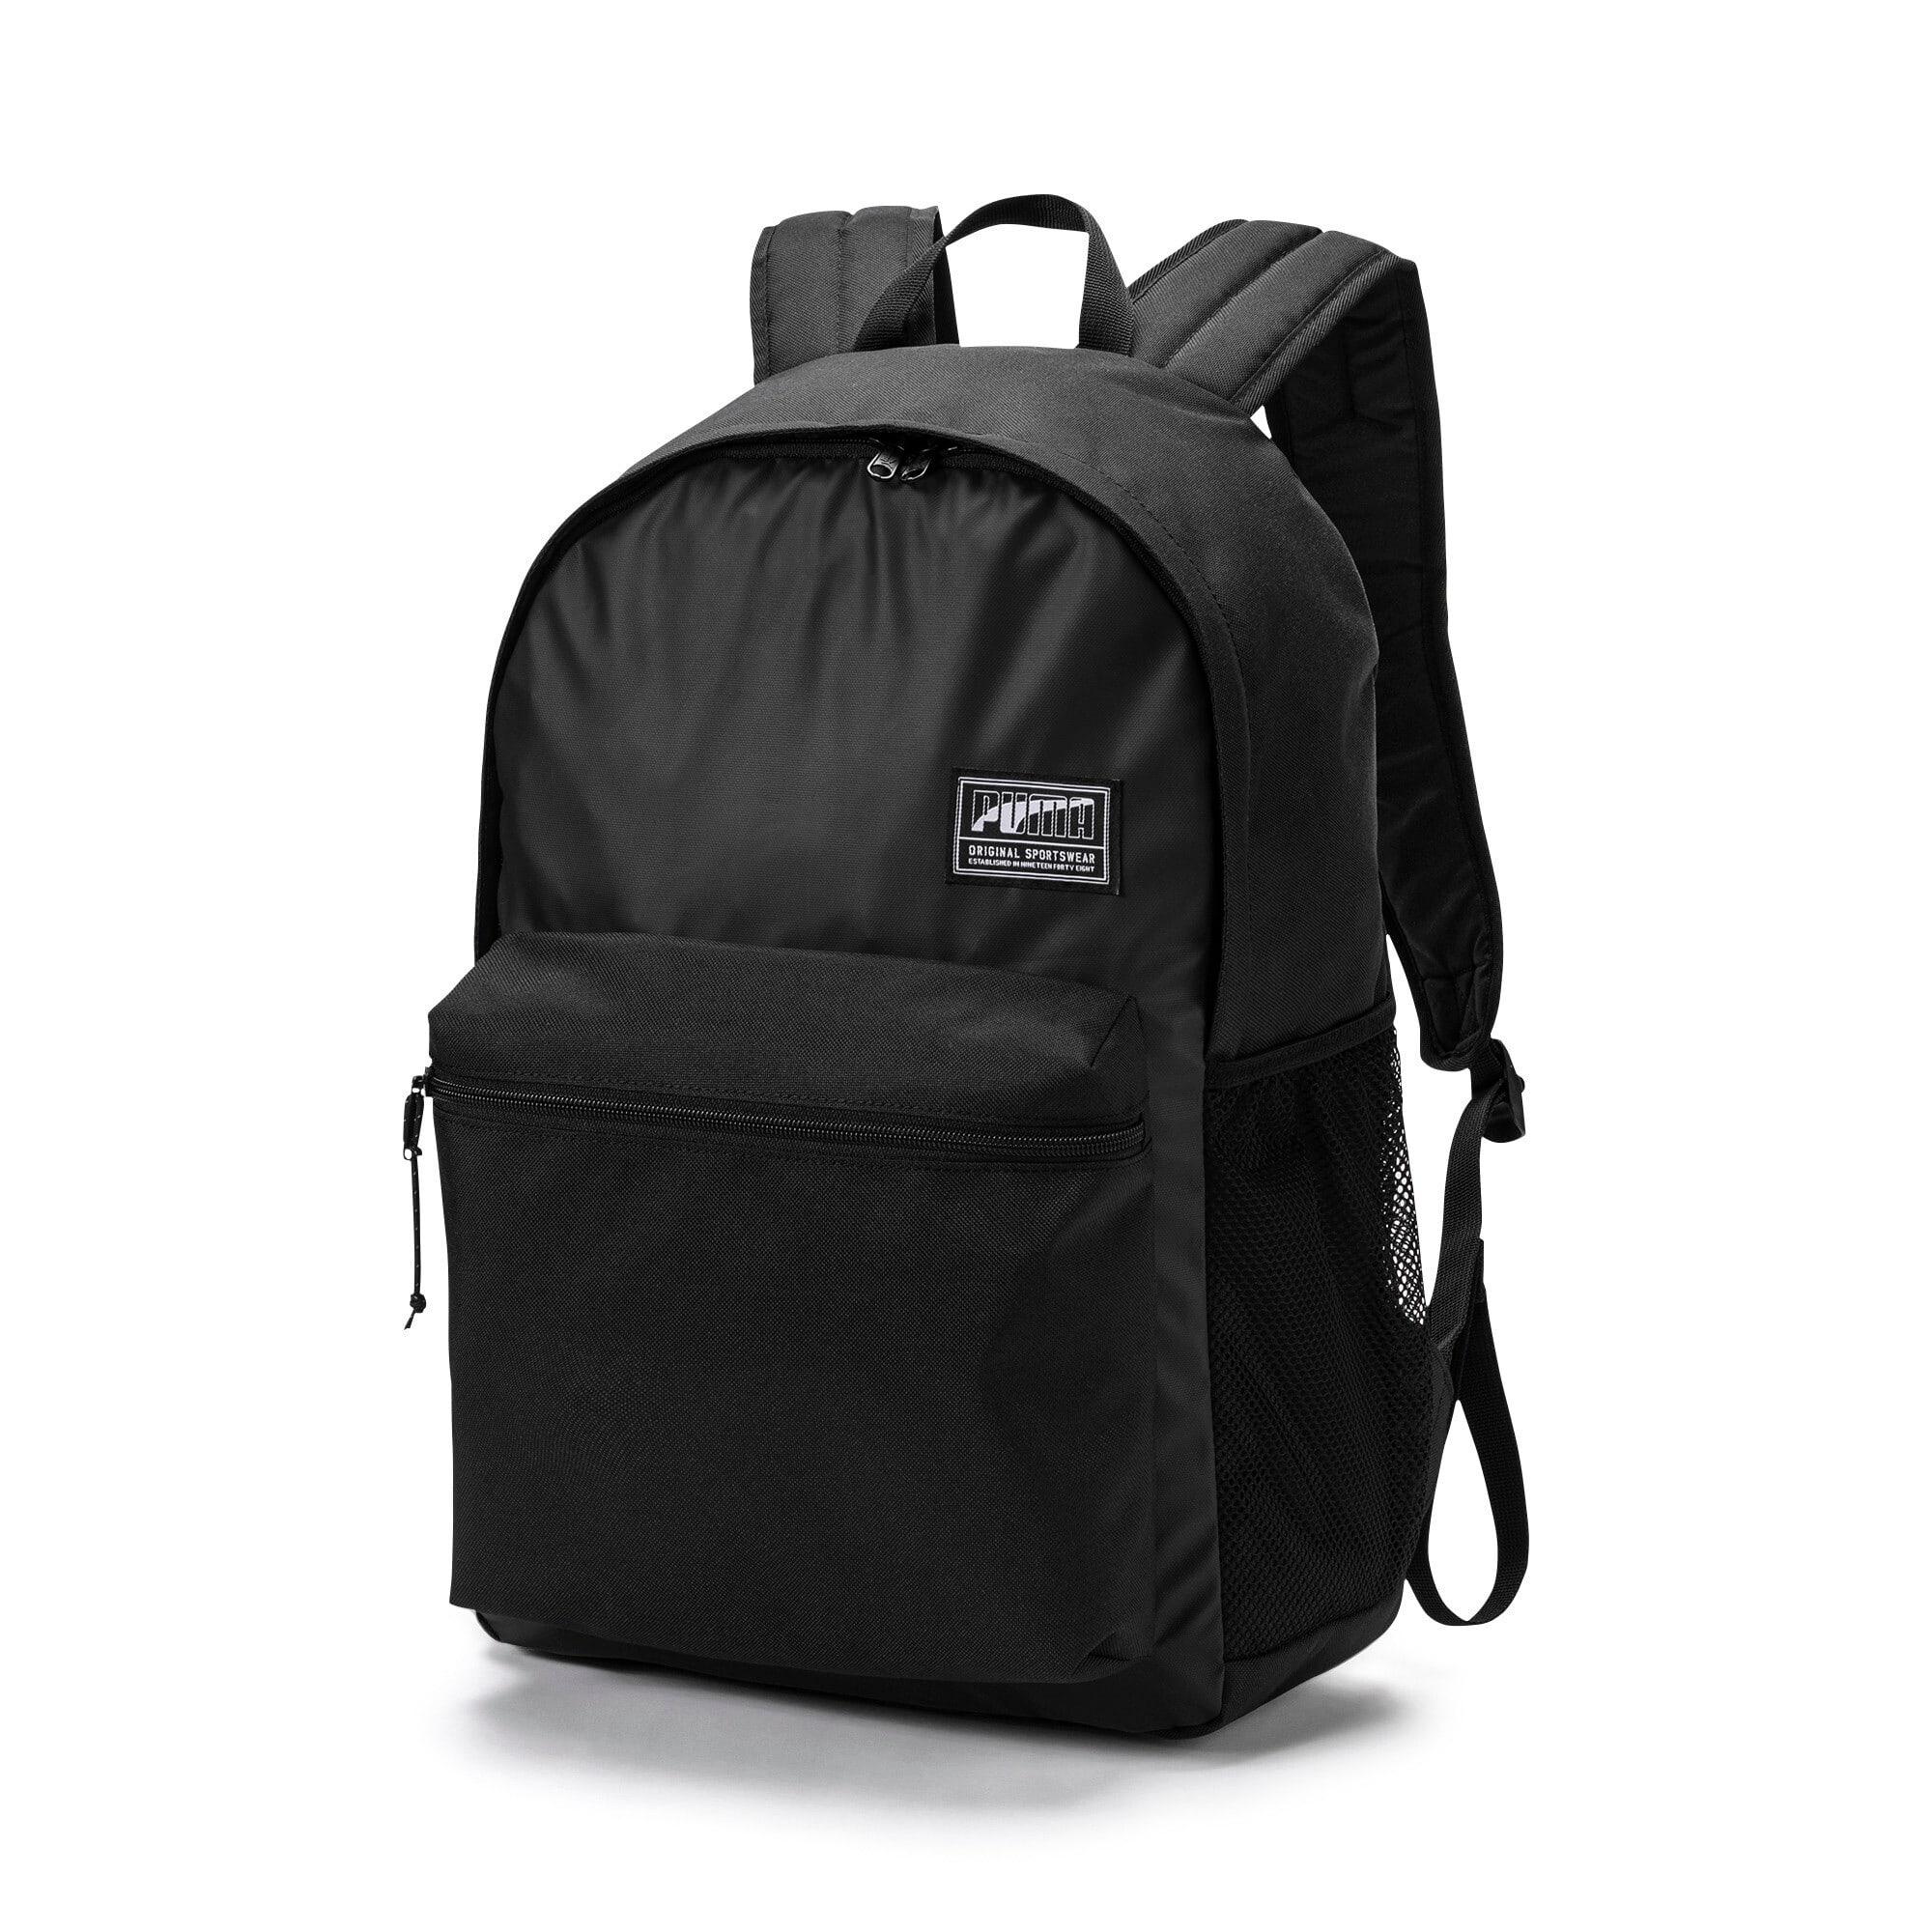 Thumbnail 1 of PUMA Academy Backpack, Puma Black, medium